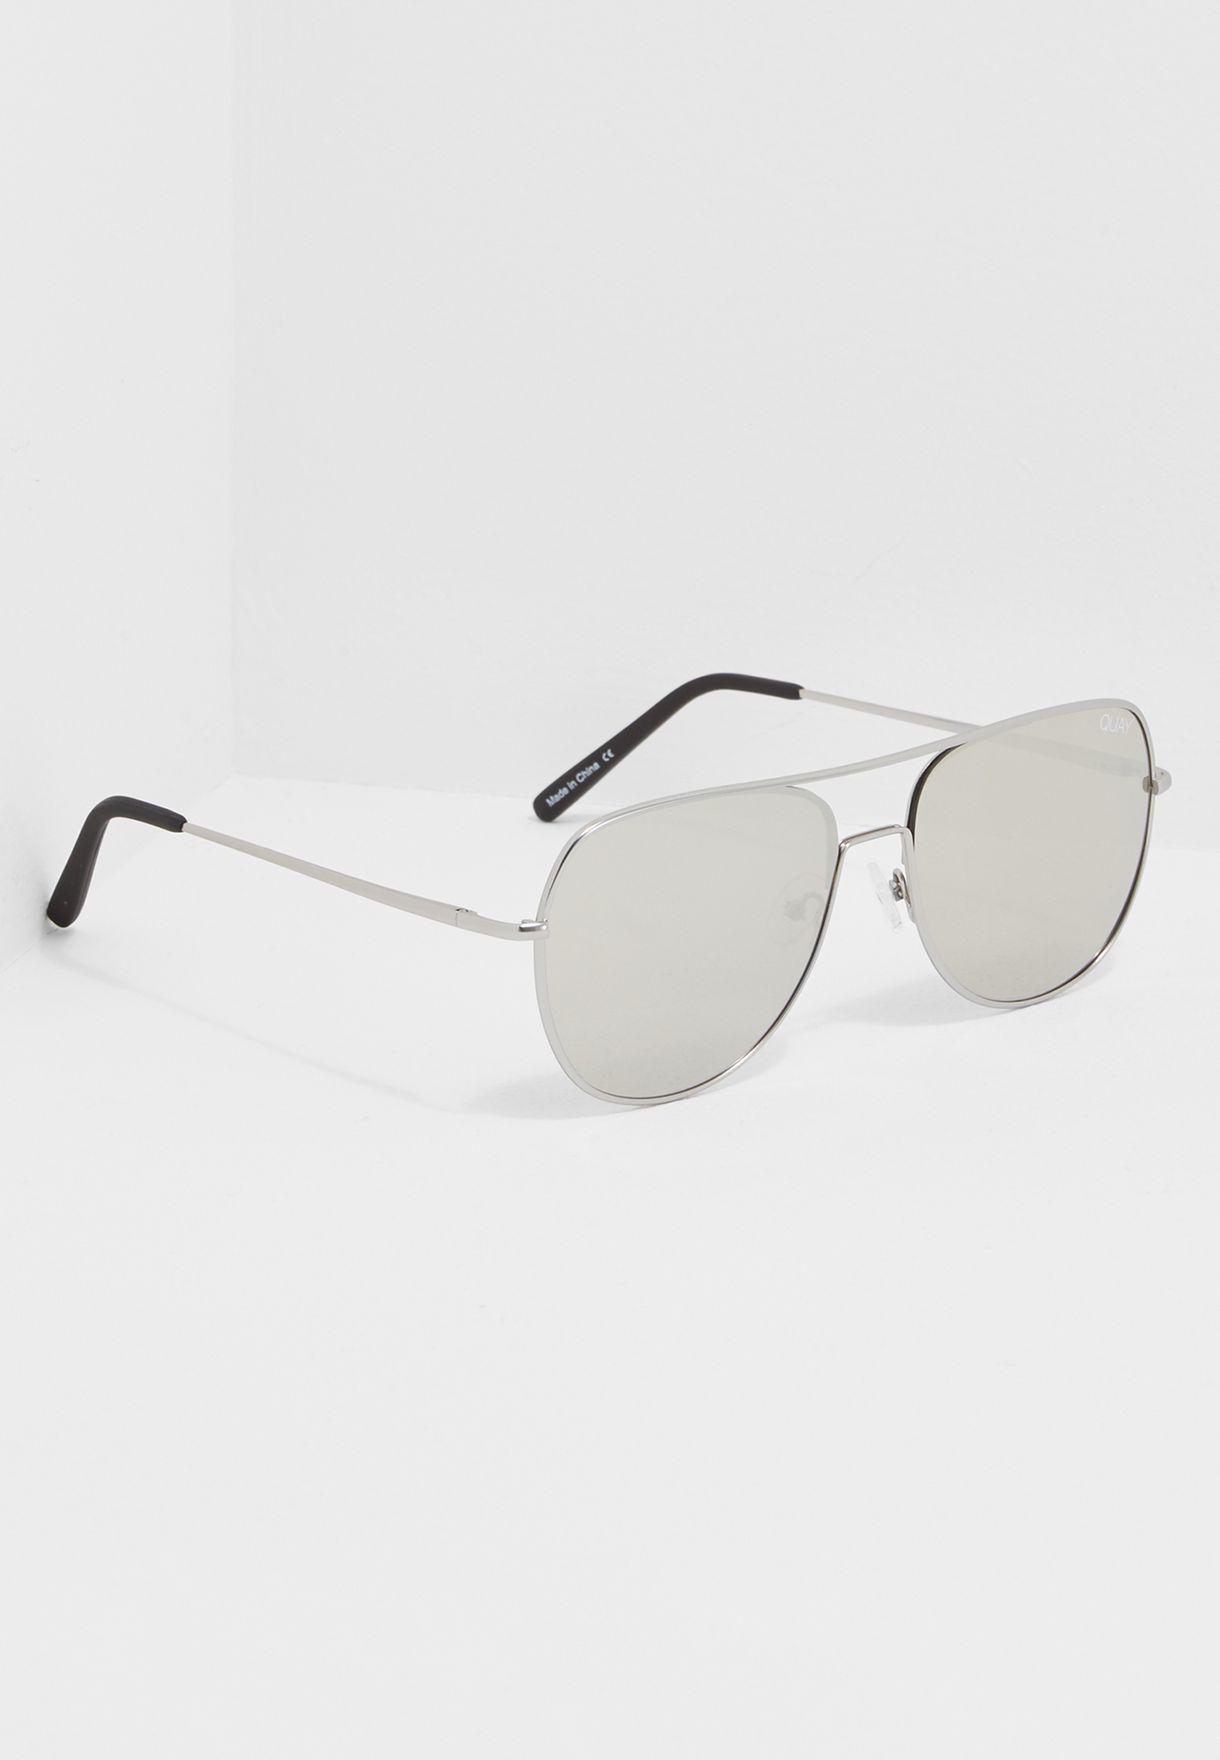 678c1e93ecf0c Shop Quay Australia silver Living Large Sunglasses QM-000200 for Men ...